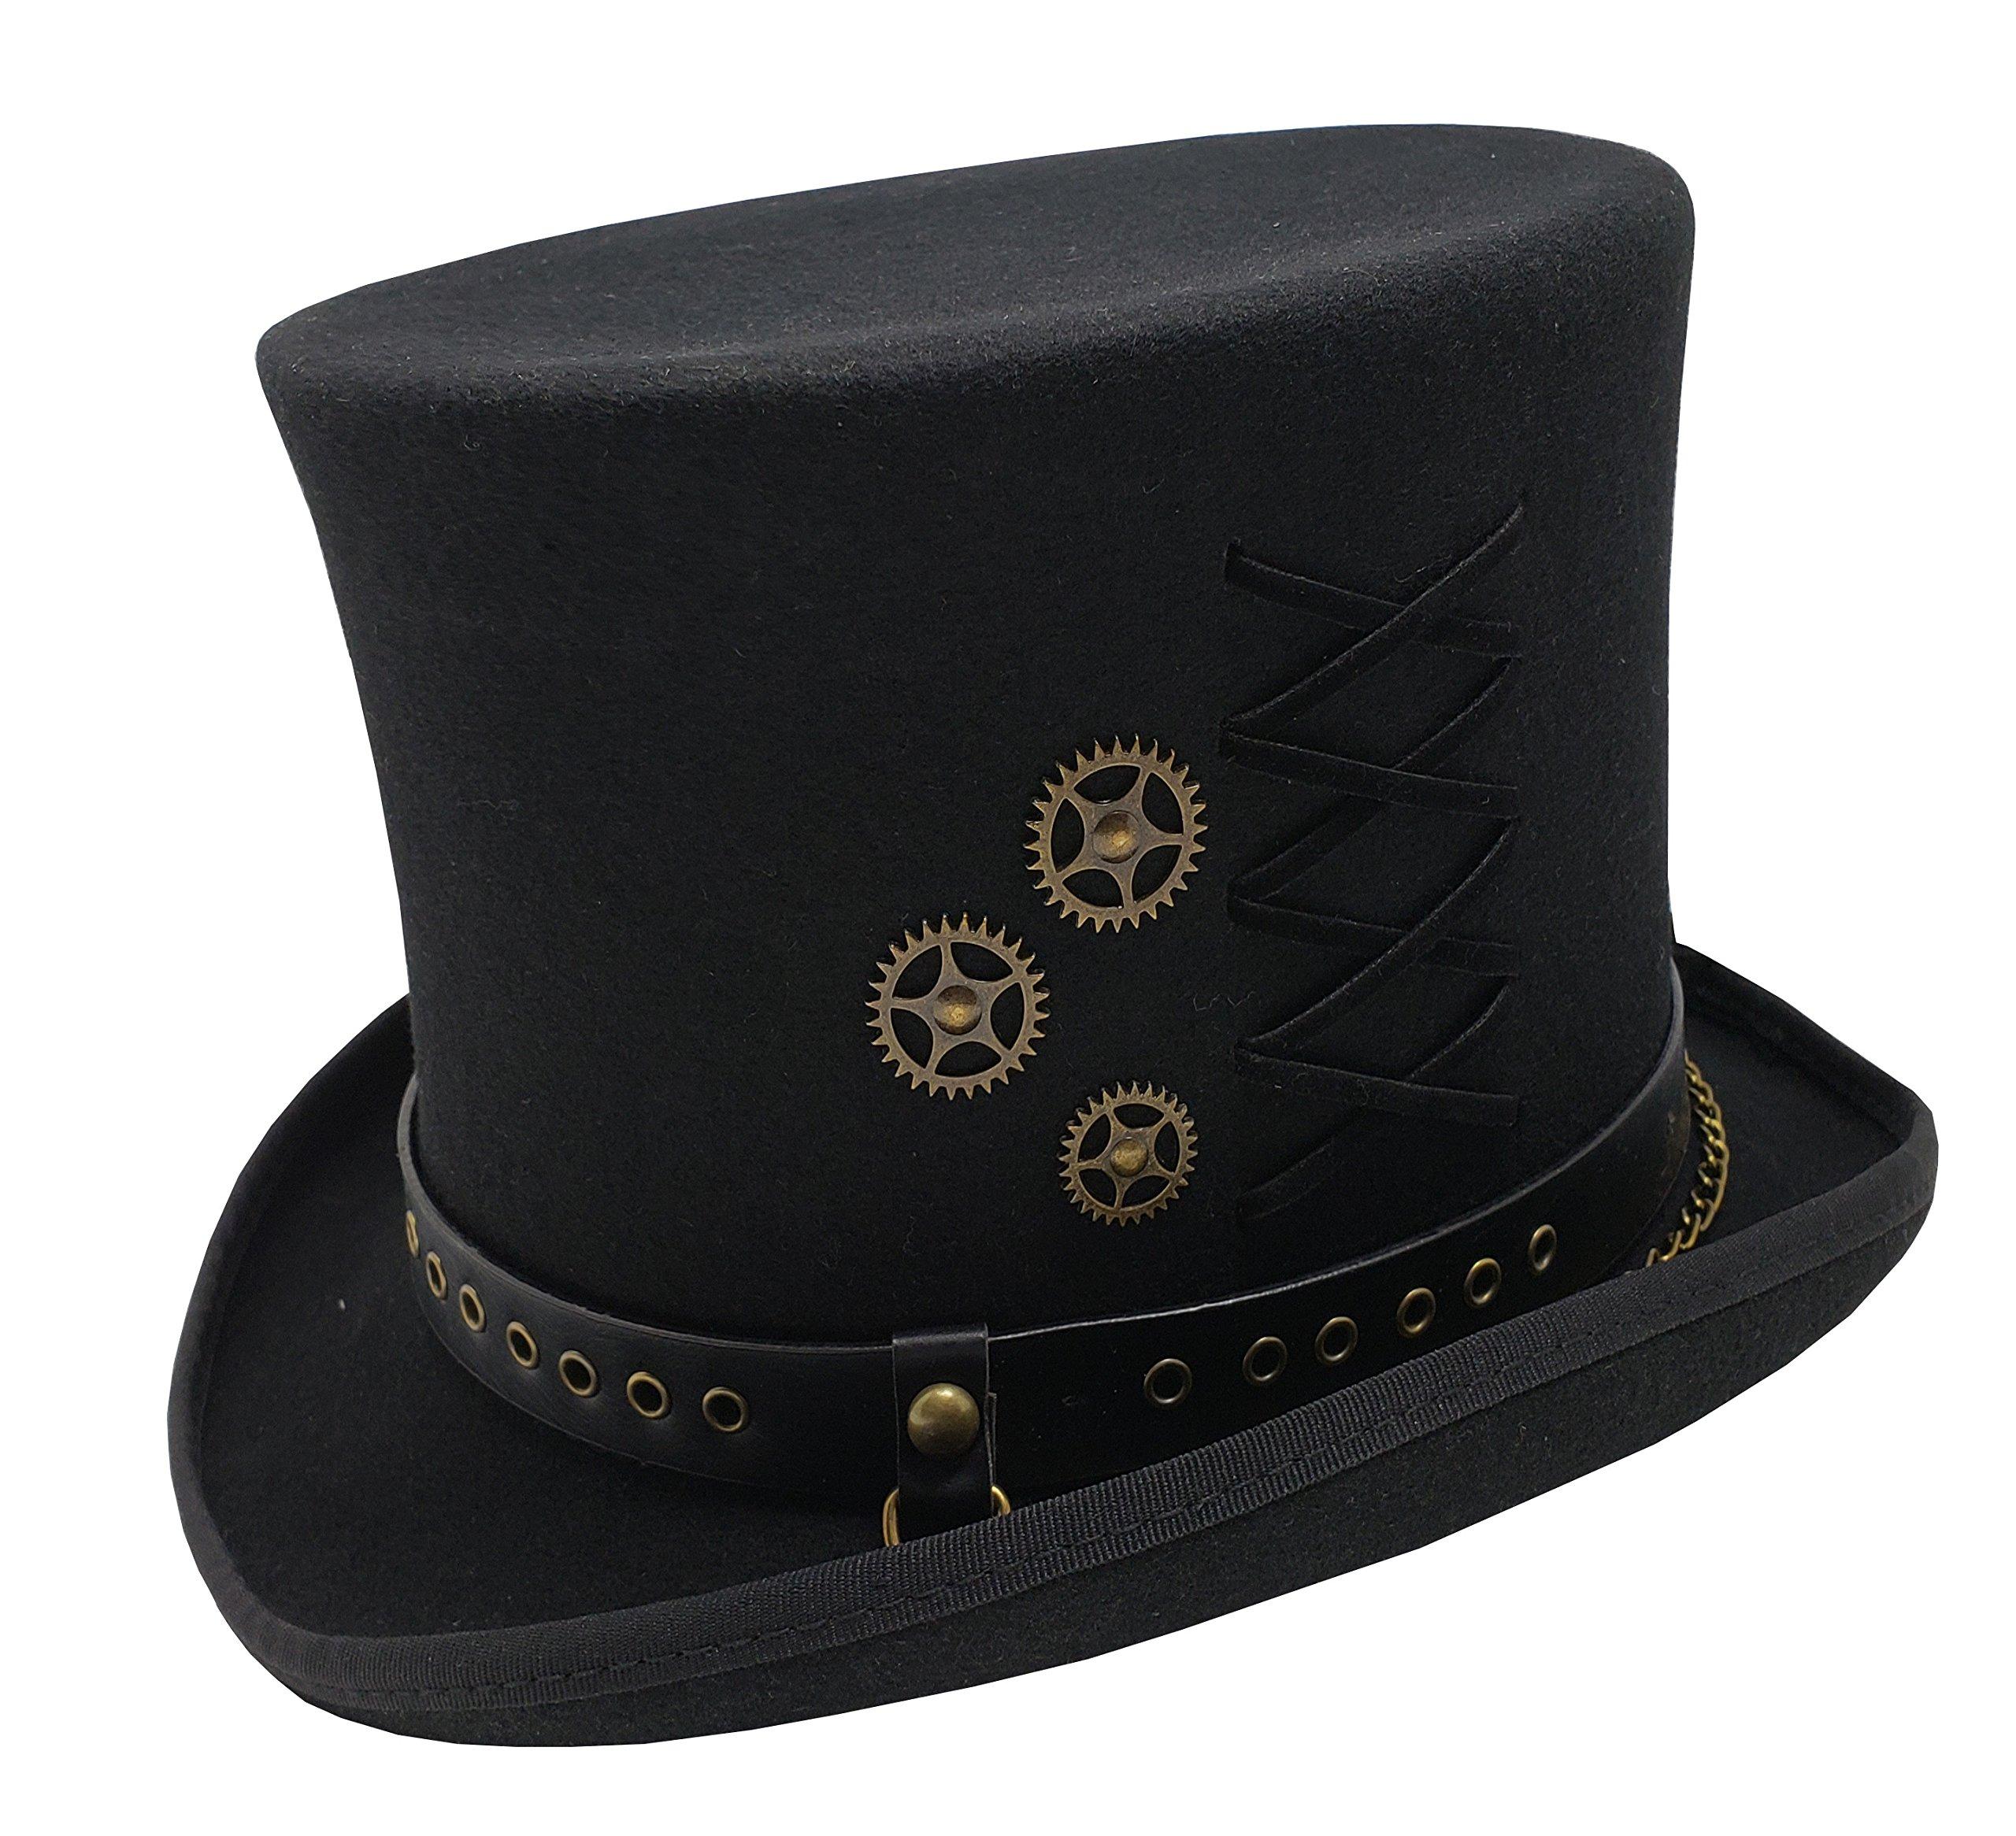 Different Touch 100% Wool Felt Steampunk 6'' Tall Top Hats (XL, Black)